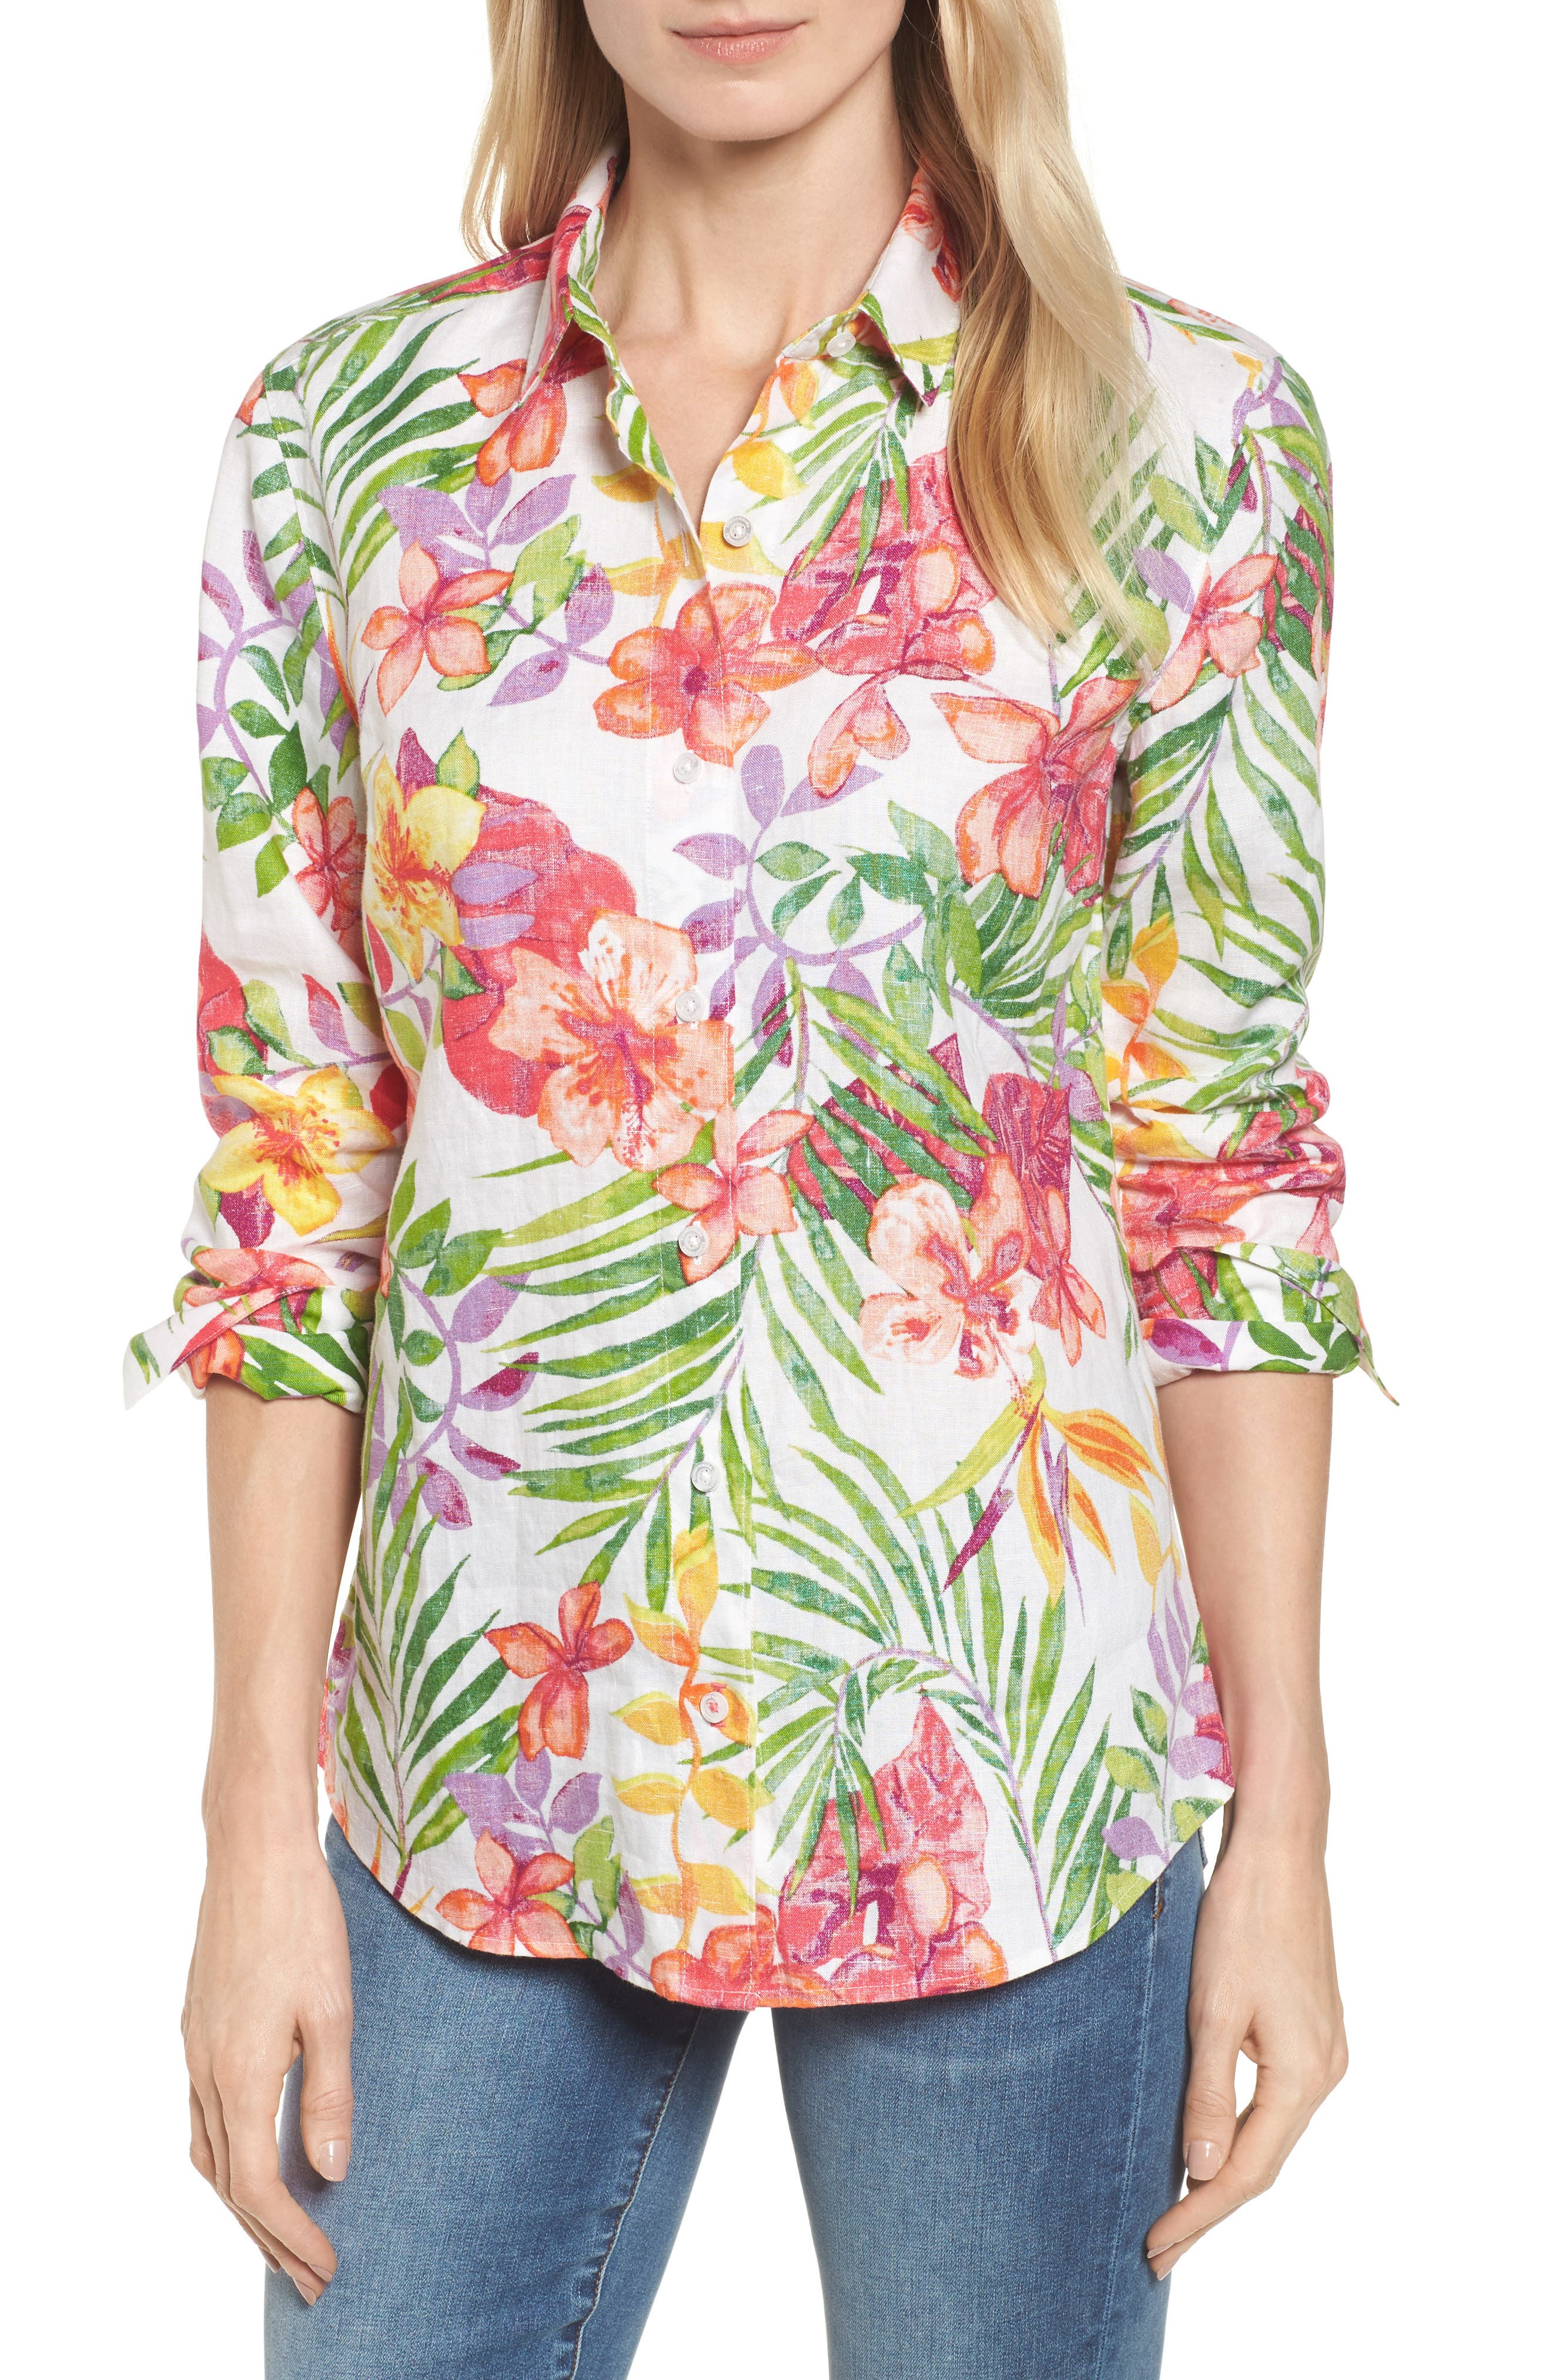 Marabella Blooms Button Down Shirt,                         Main,                         color, White